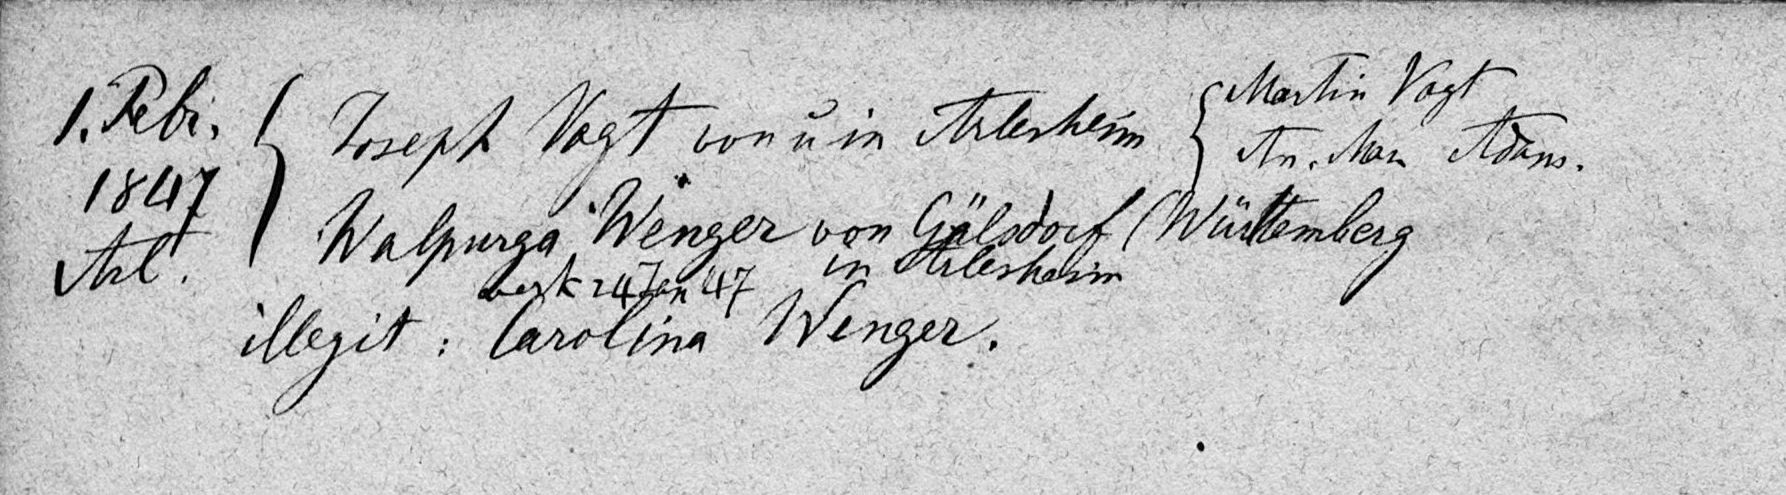 Joseph Vogt (Ehe 1847 in Arlesheim)